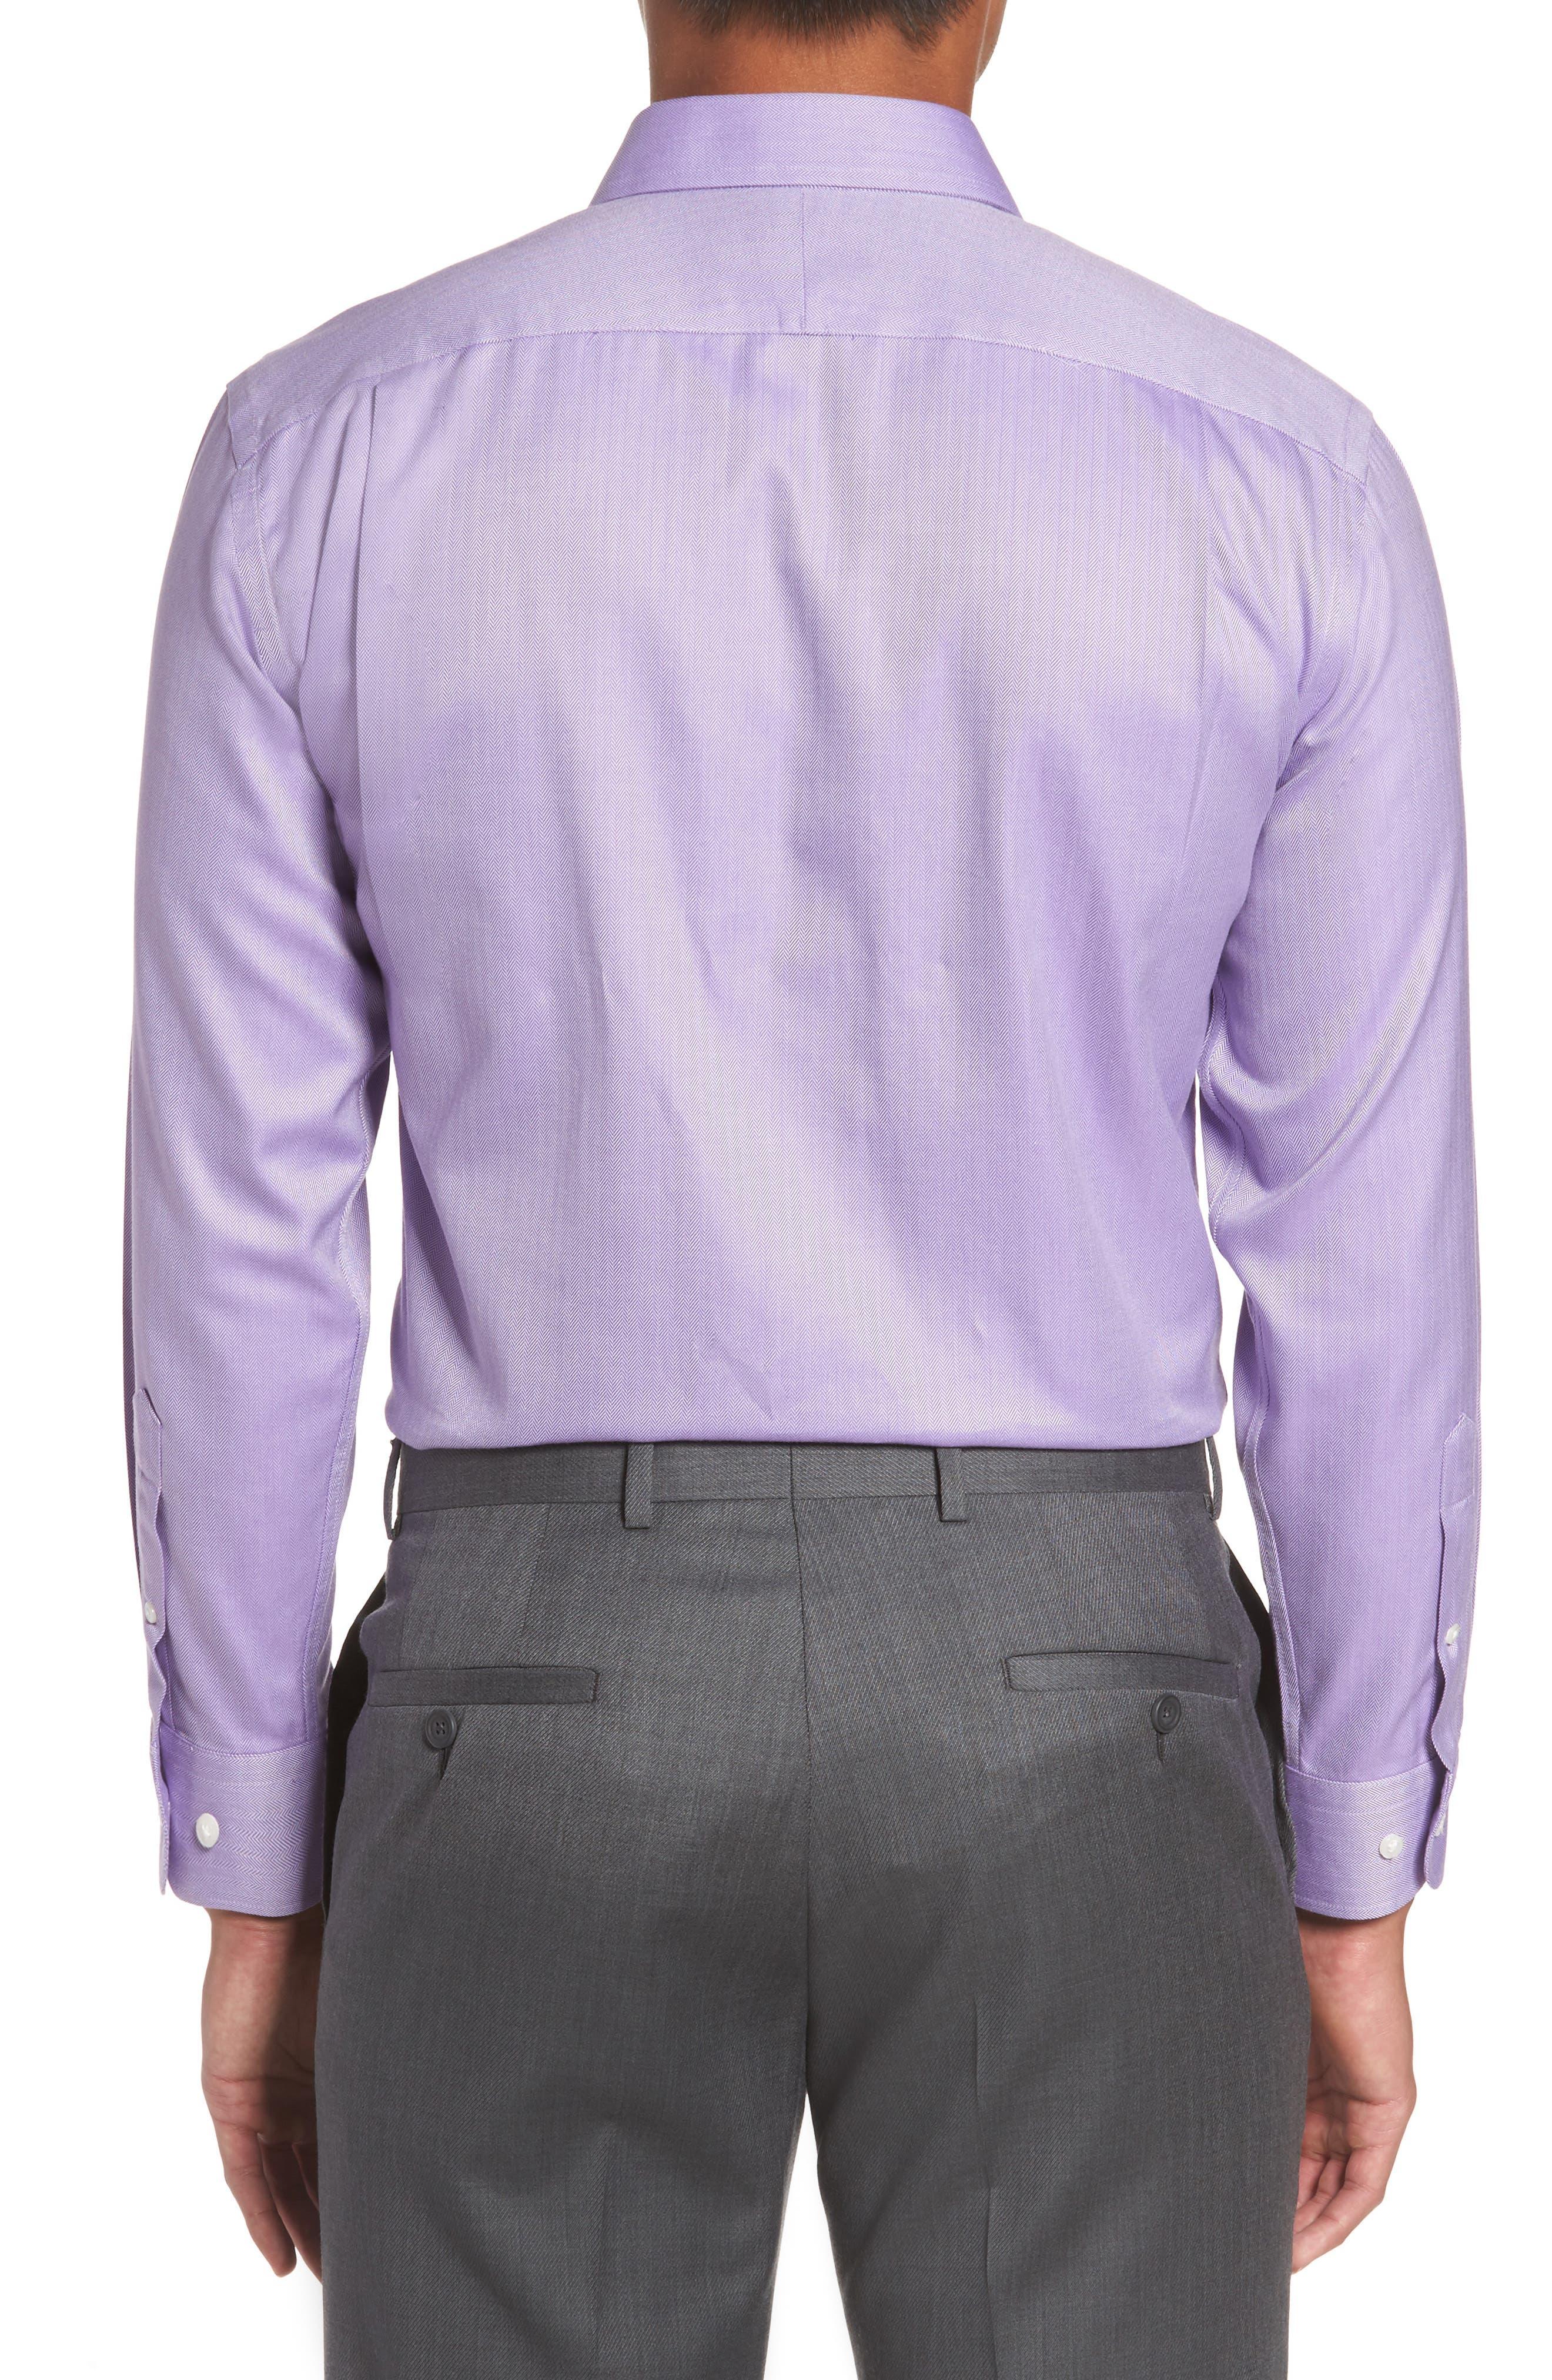 Smartcare<sup>™</sup> Trim Fit Herringbone Dress Shirt,                             Alternate thumbnail 3, color,                             Lavender